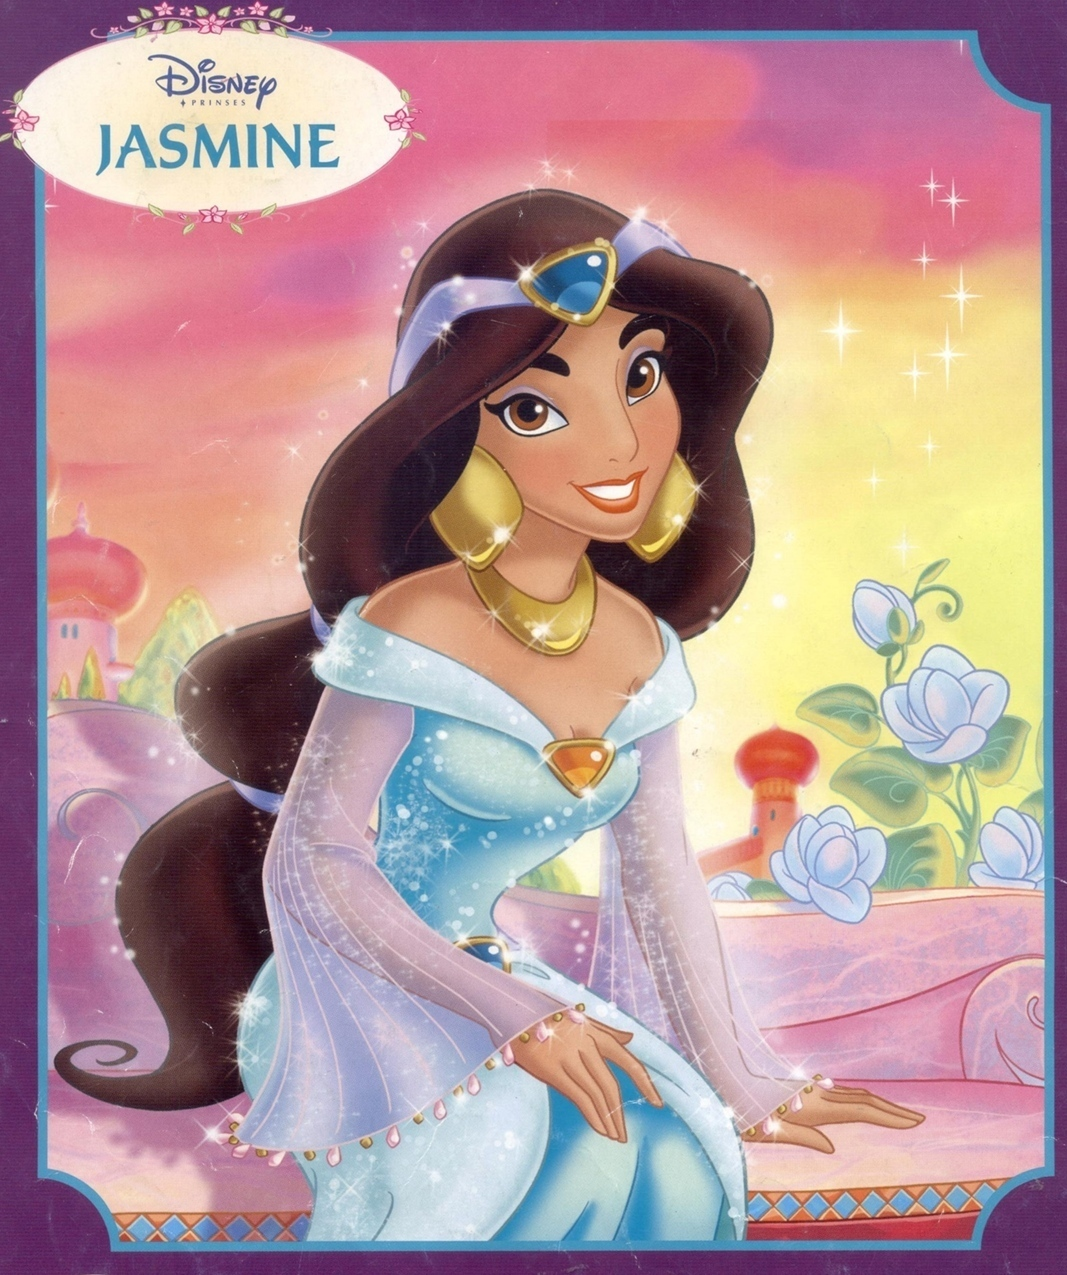 news and entertainment princess jan 04 2013 21